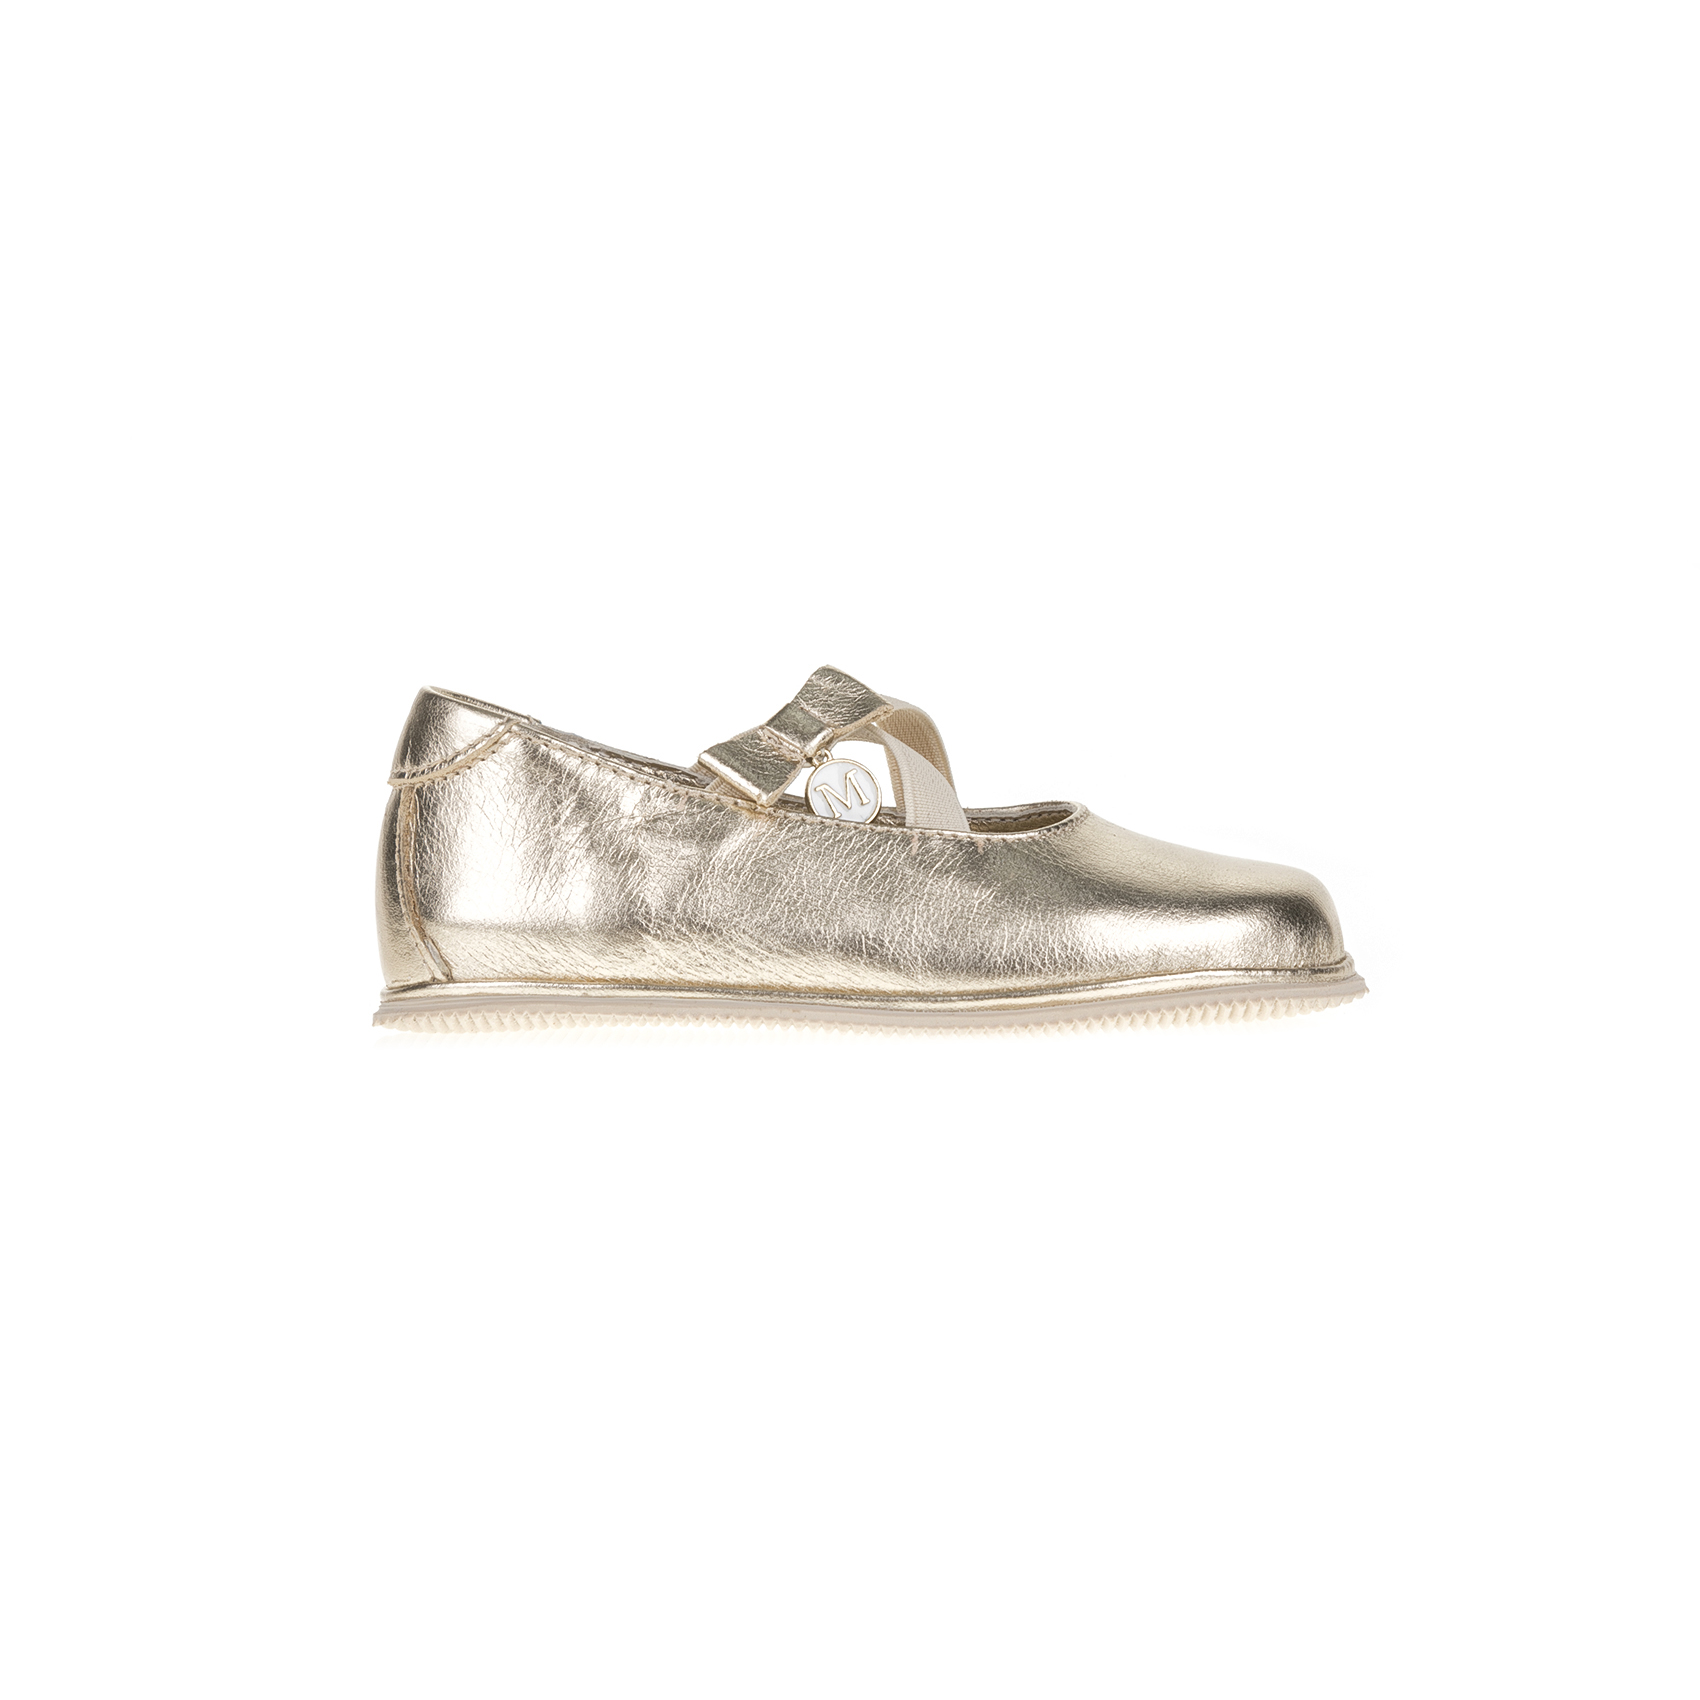 MONNALISA SHOES - Μπαλαρίνες MONNALISA SHOES PREPASSI LAMINA χρυσές παιδικά girls παπούτσια casual